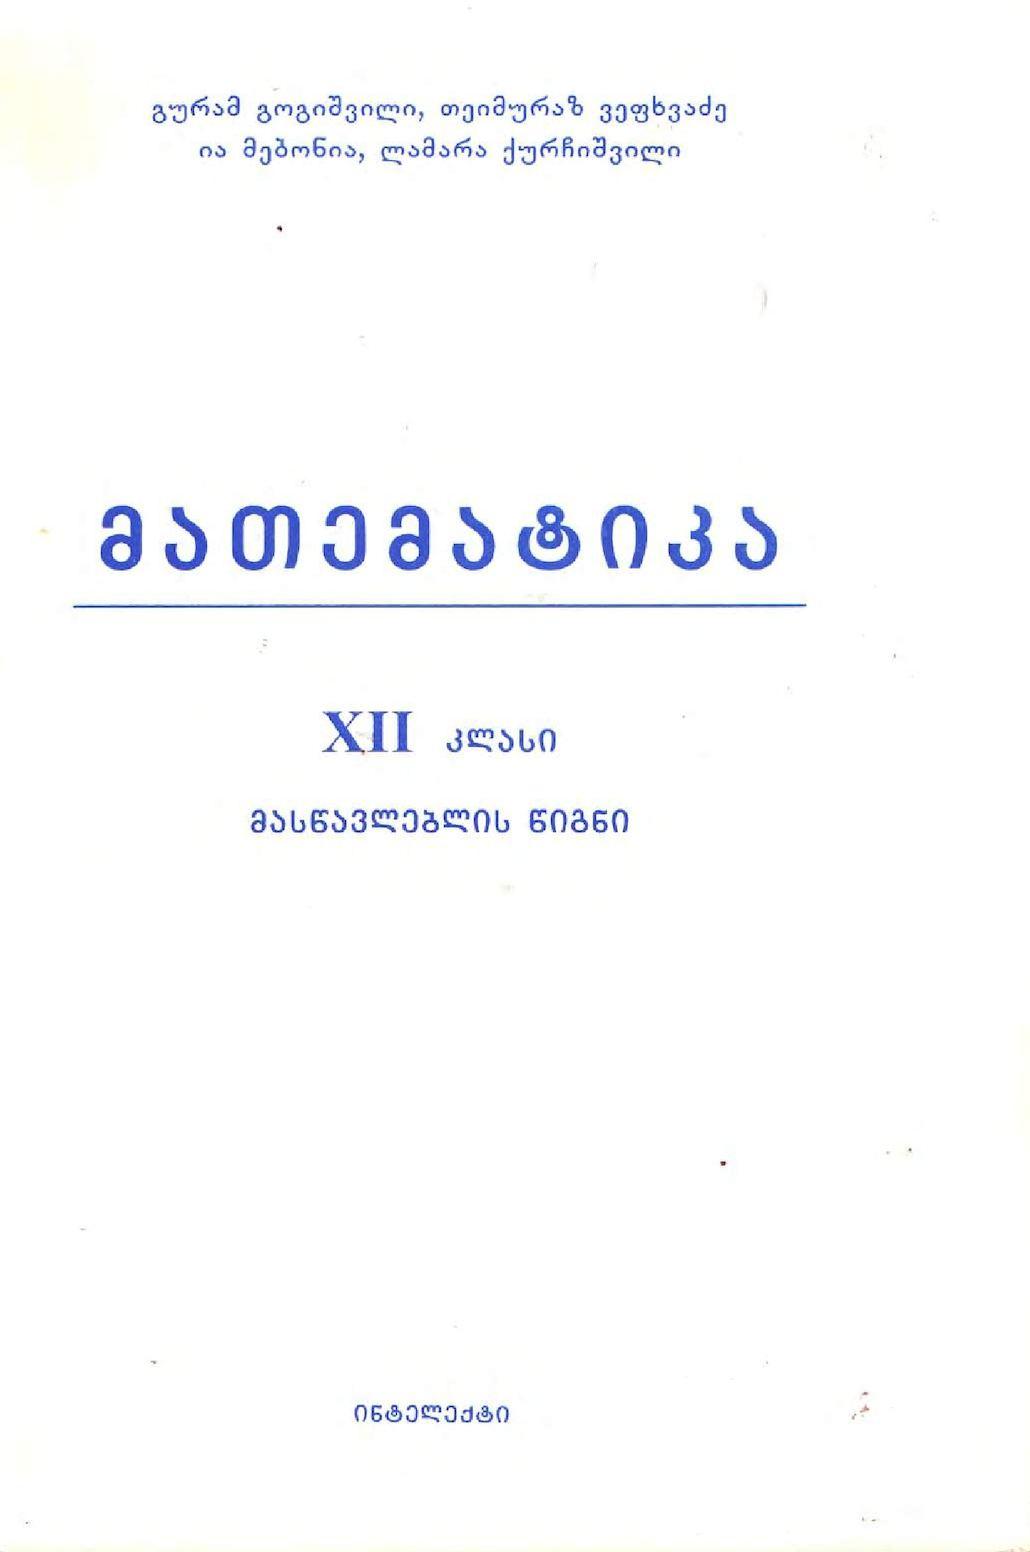 Xii კლასი მათემატიკა (მასწავლებლის წიგნი) გ გოგიშვილი, თ ვეფხვაძე და სხვ Compressed